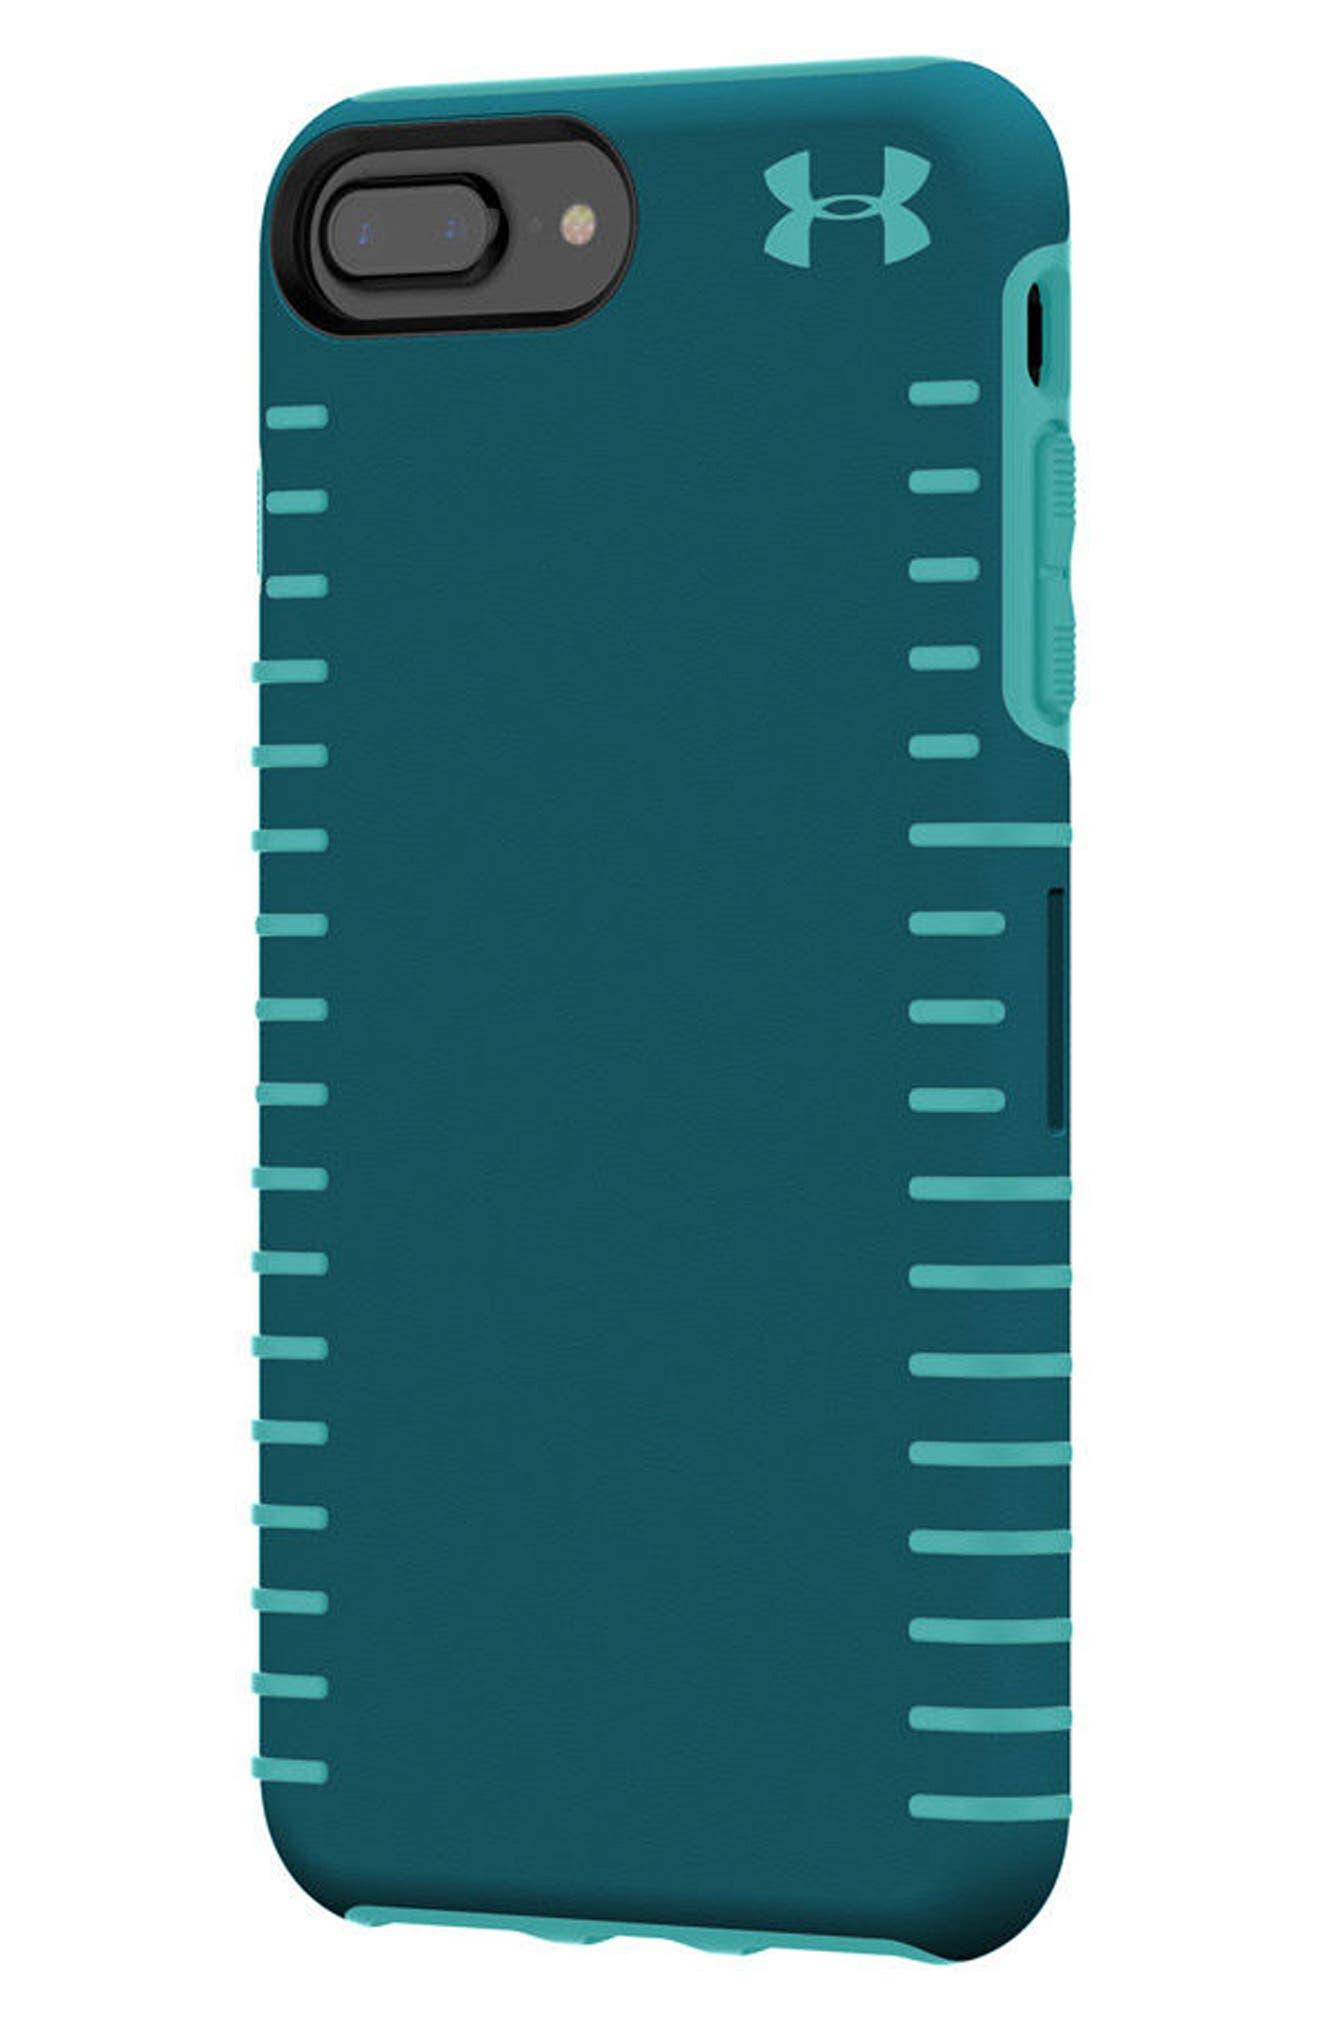 Protect Grip iPhone 6/6s/7/8 Plus Case,                             Alternate thumbnail 2, color,                             Desert Sky